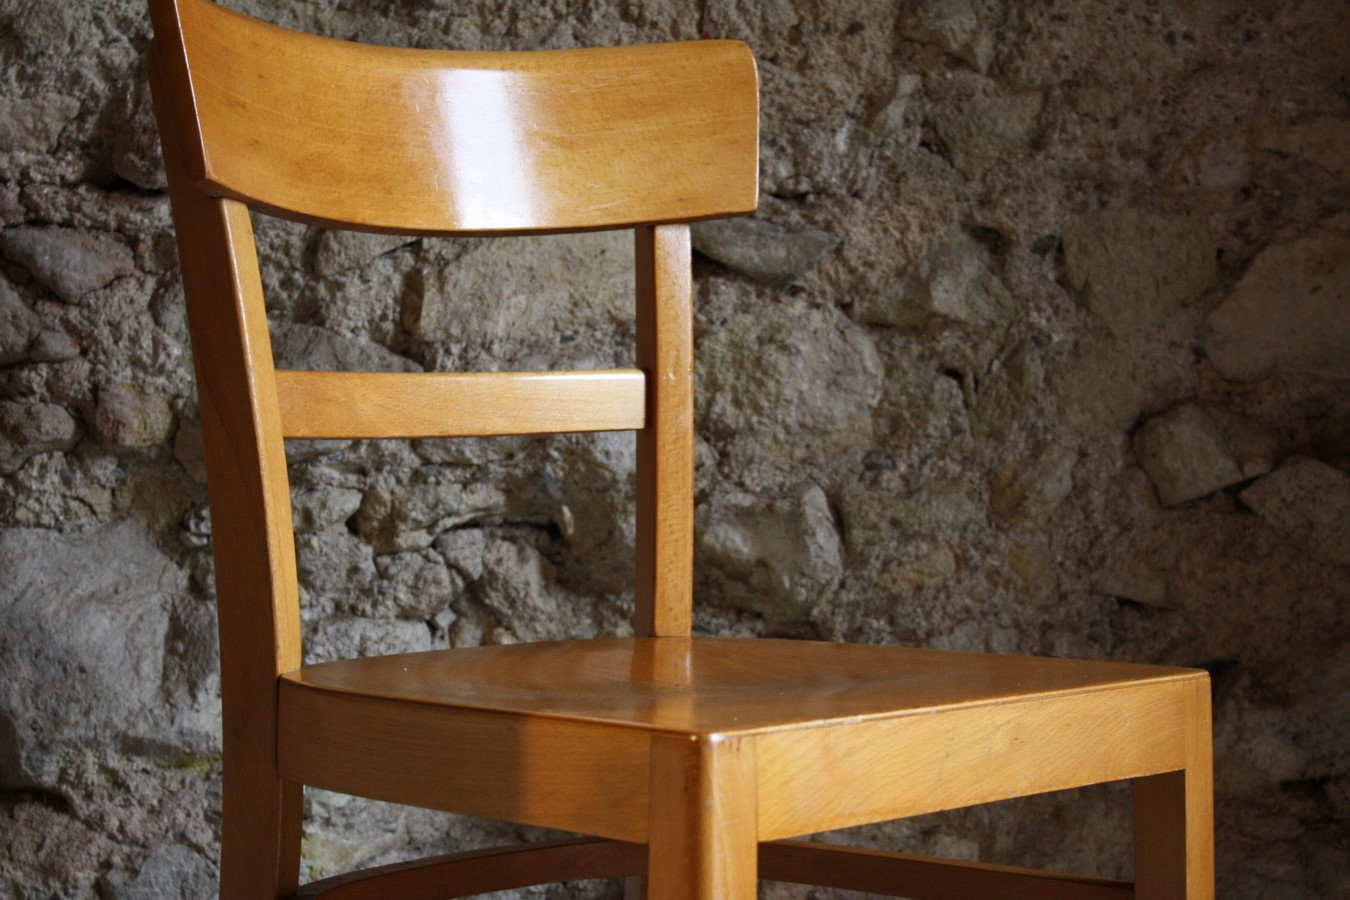 Stoelcker Stuhl Stuhl Sitzhhe 55 Cm Excellent Stuhl Gre X X Cm